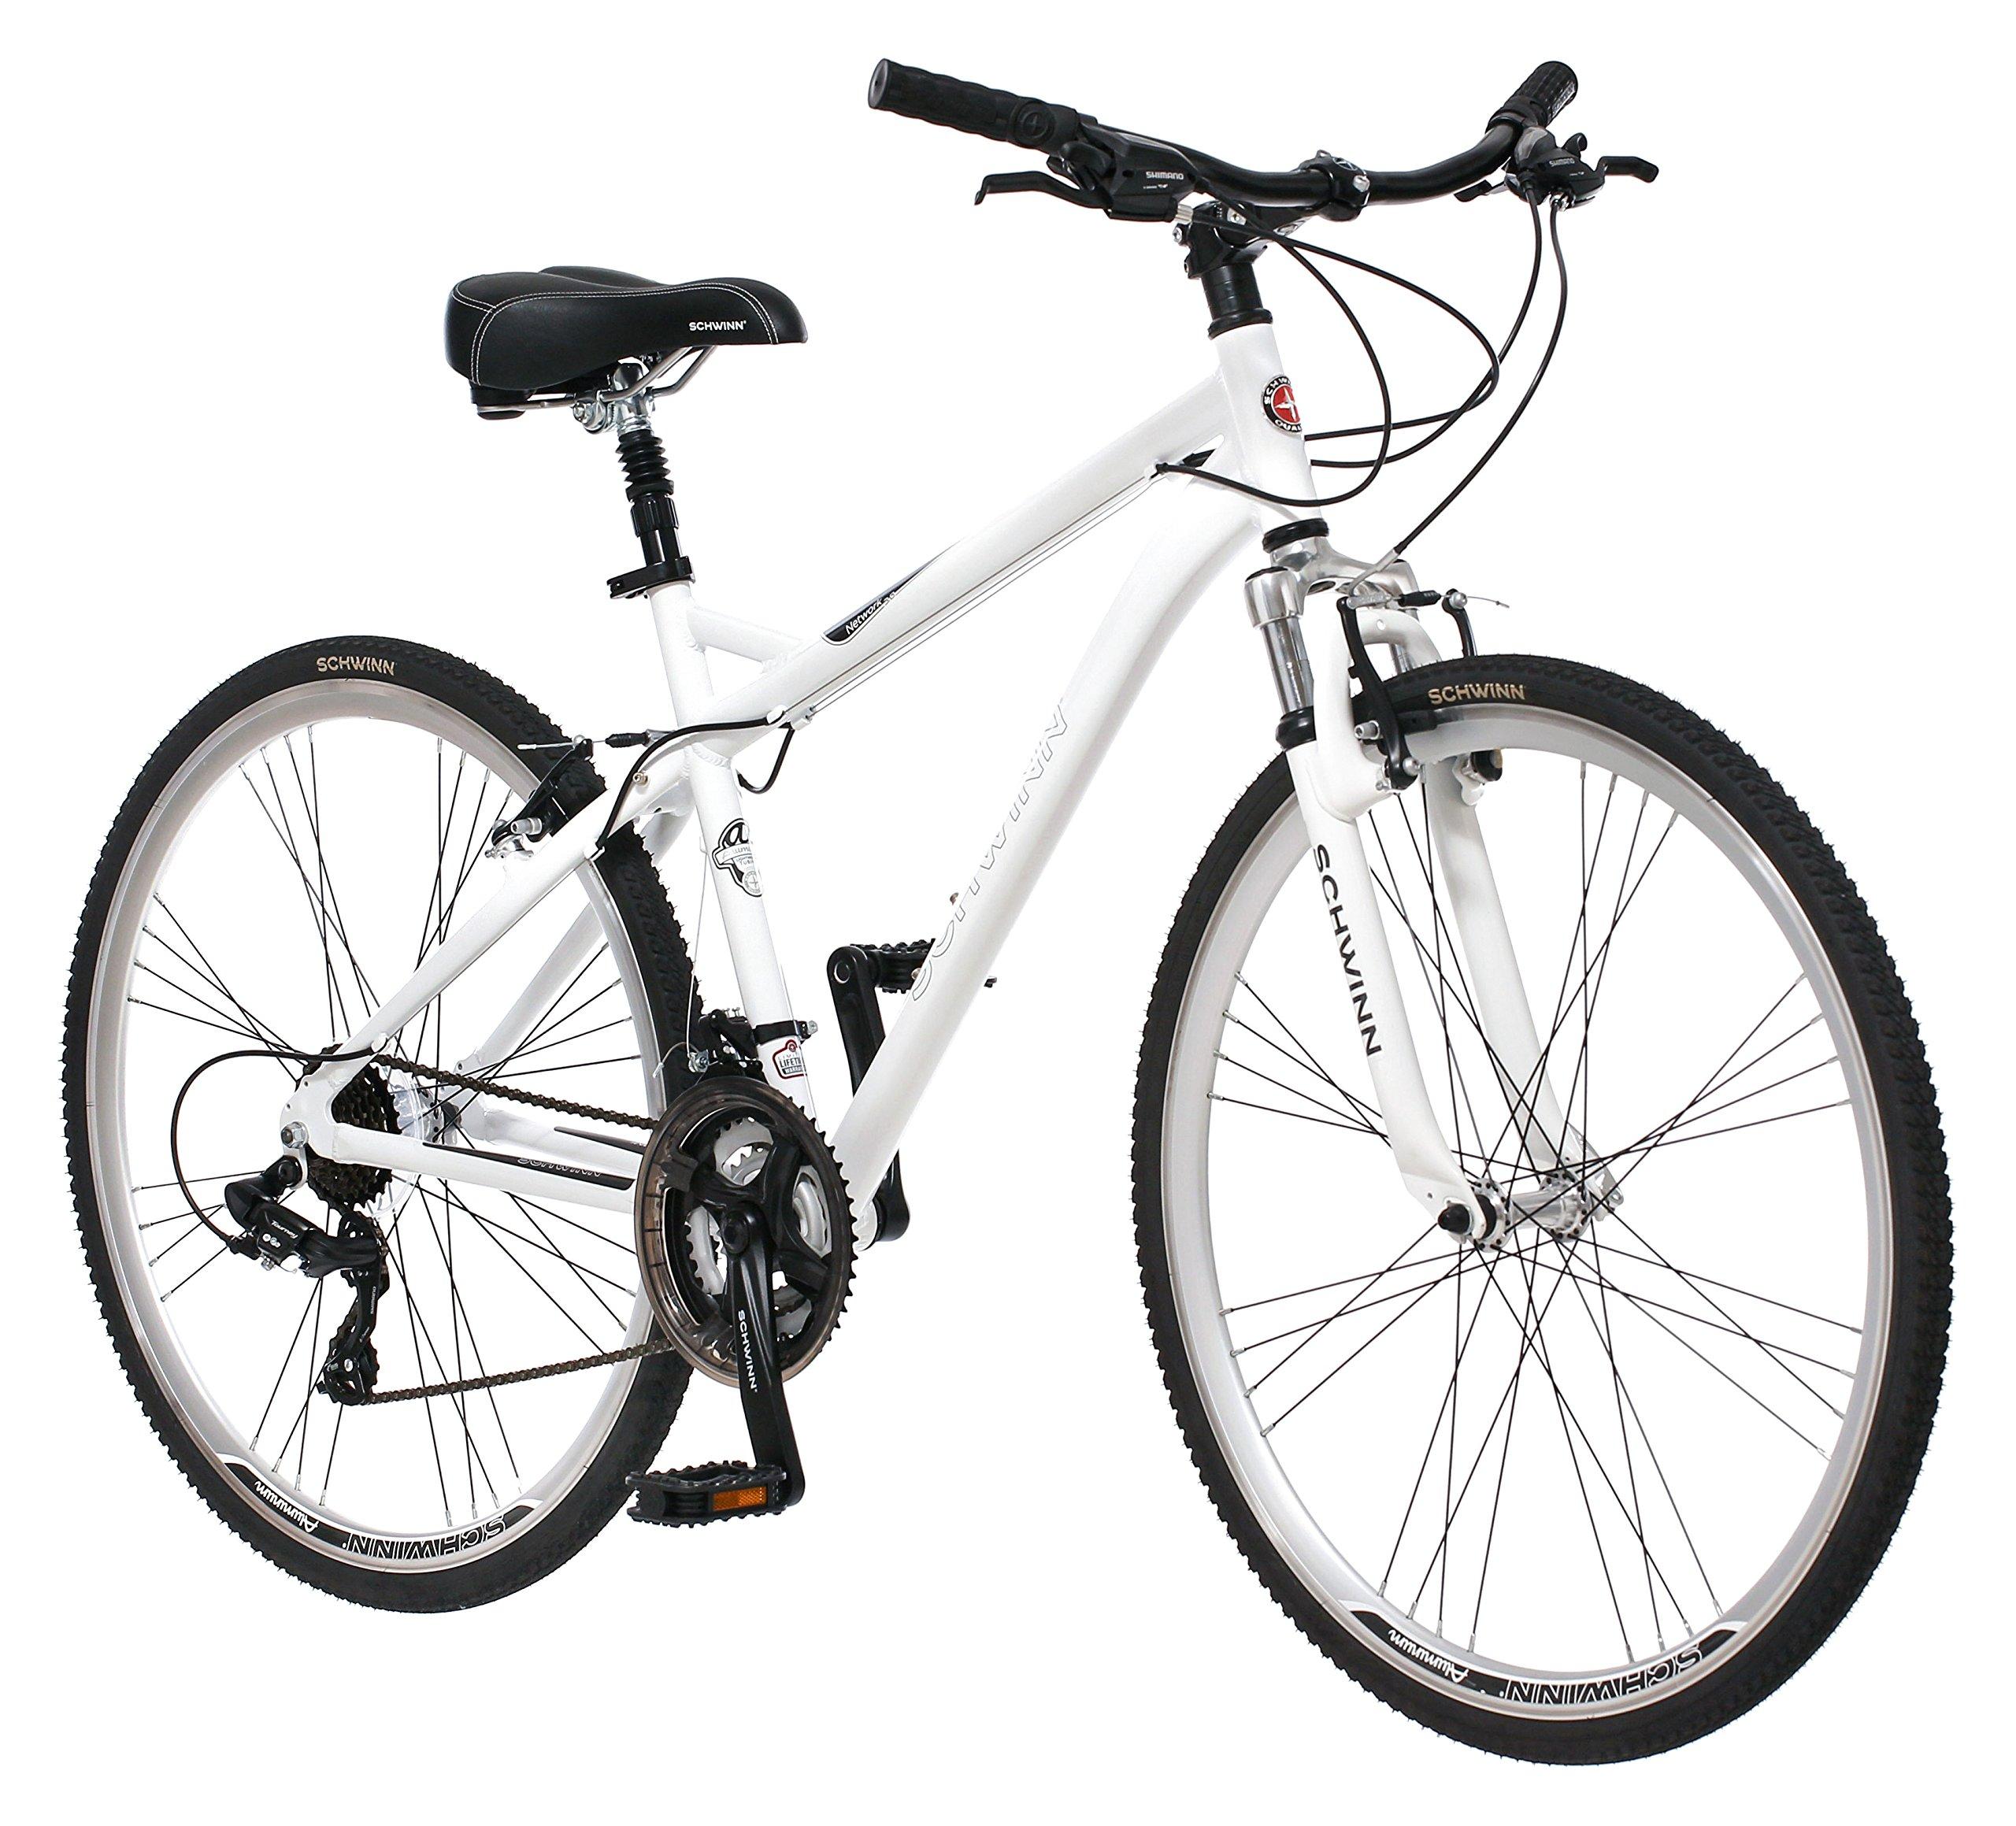 Cheap 3 Wheel Schwinn Bicycle, find 3 Wheel Schwinn Bicycle deals on ...